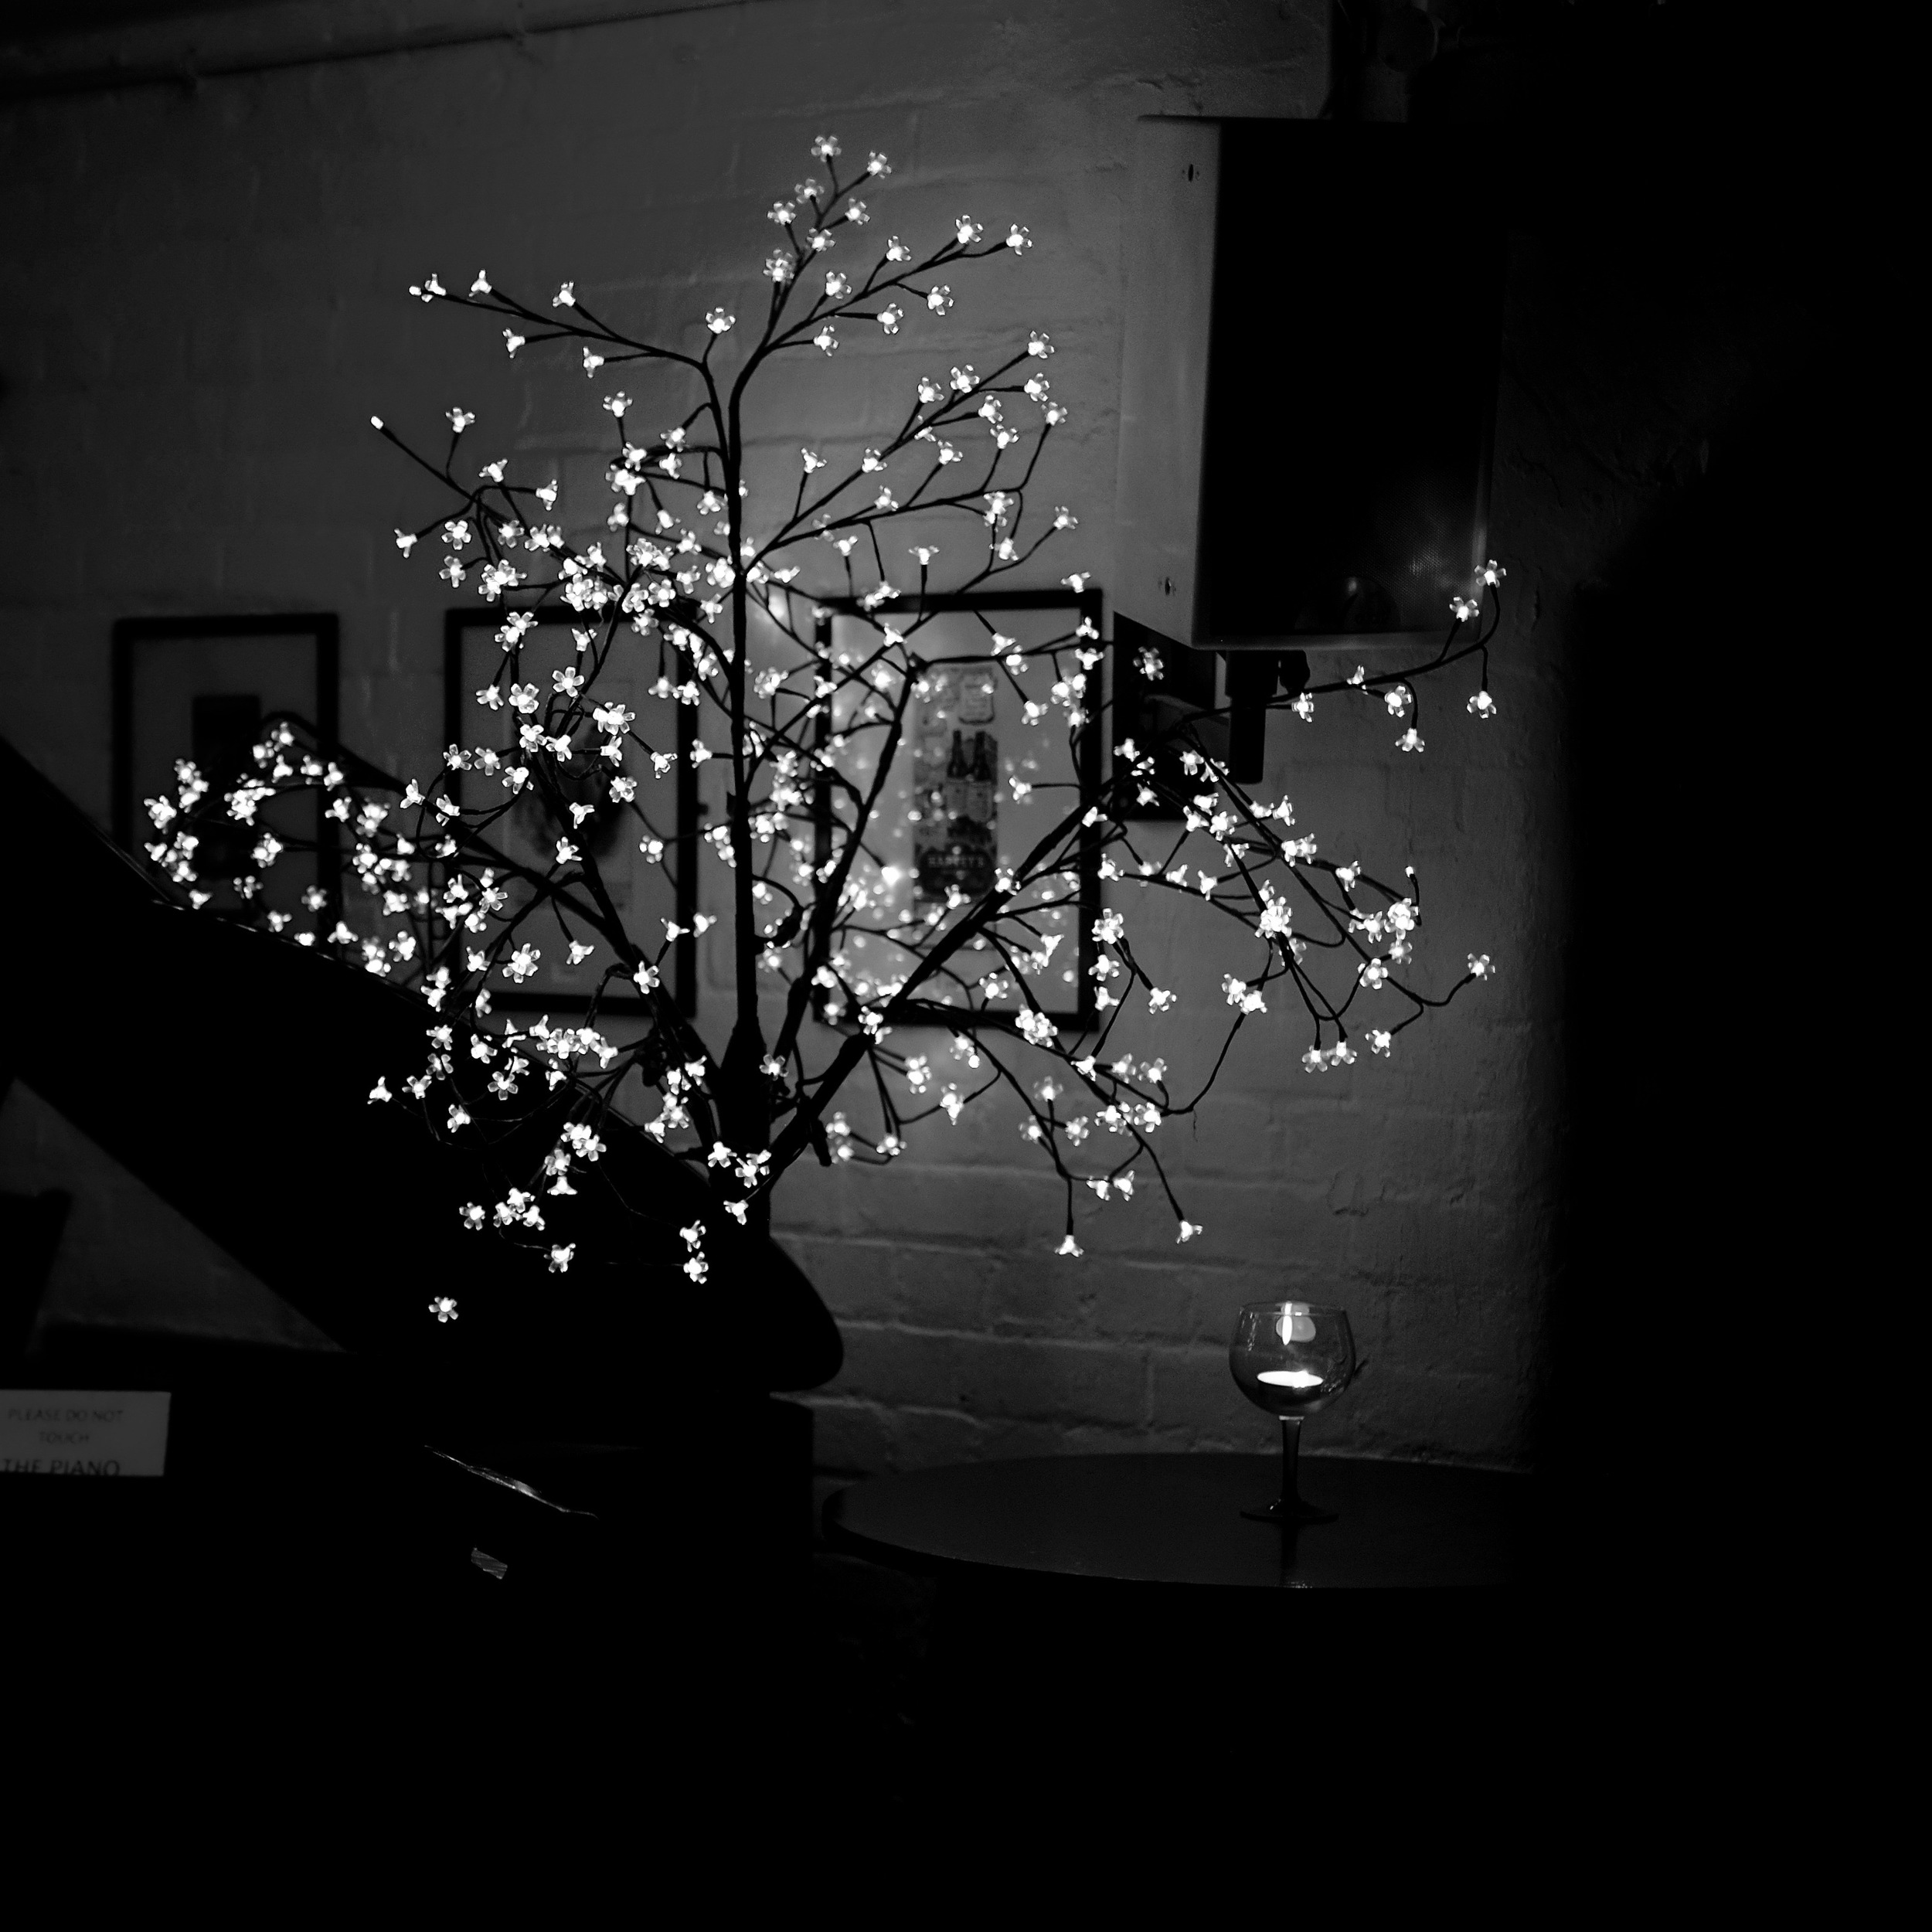 Star Tree